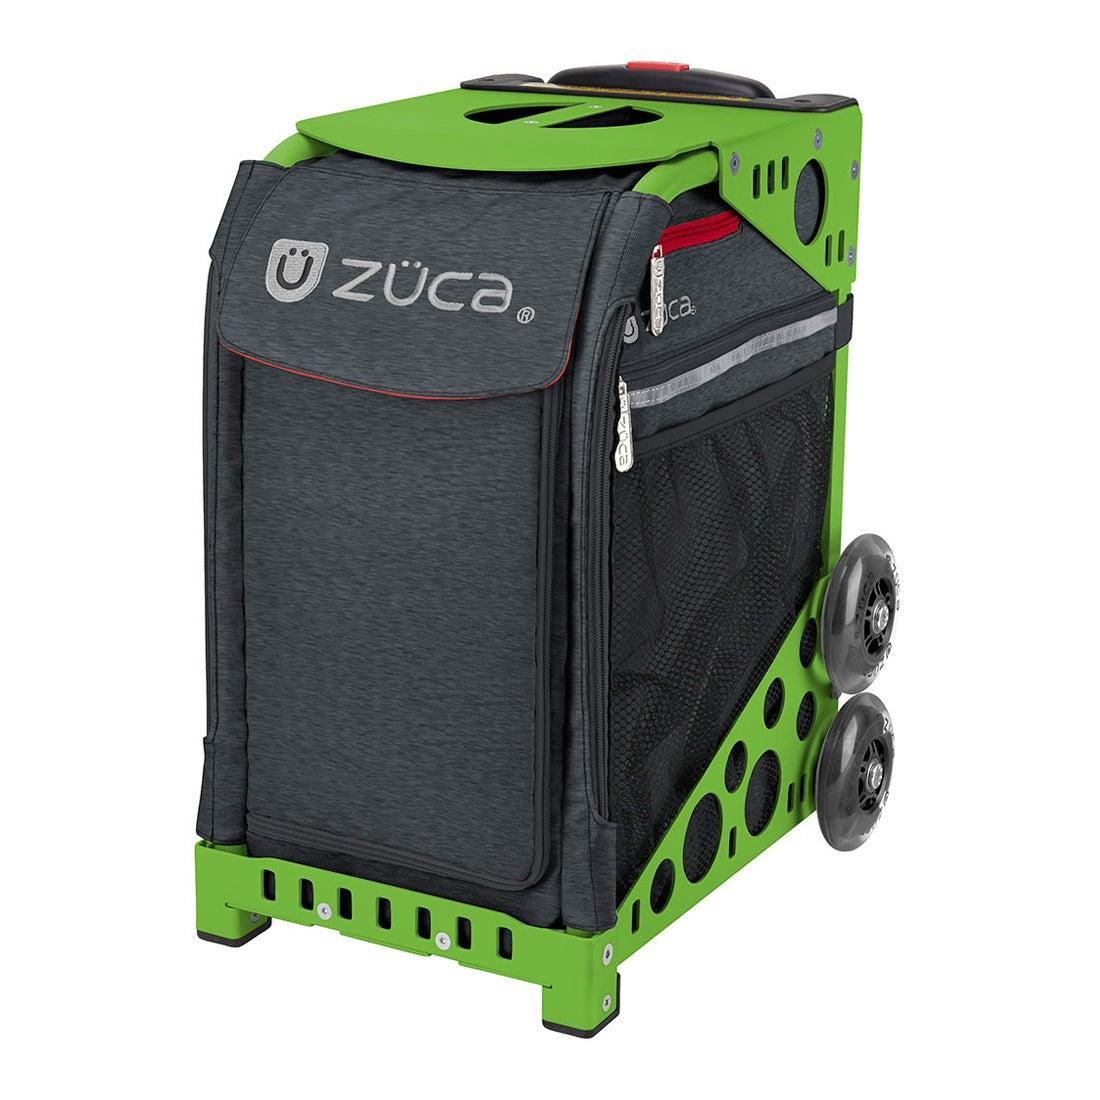 【SAC'S BAR】ZUCA Sport キャリーケース Asphalt Gray 404 Green メンズ